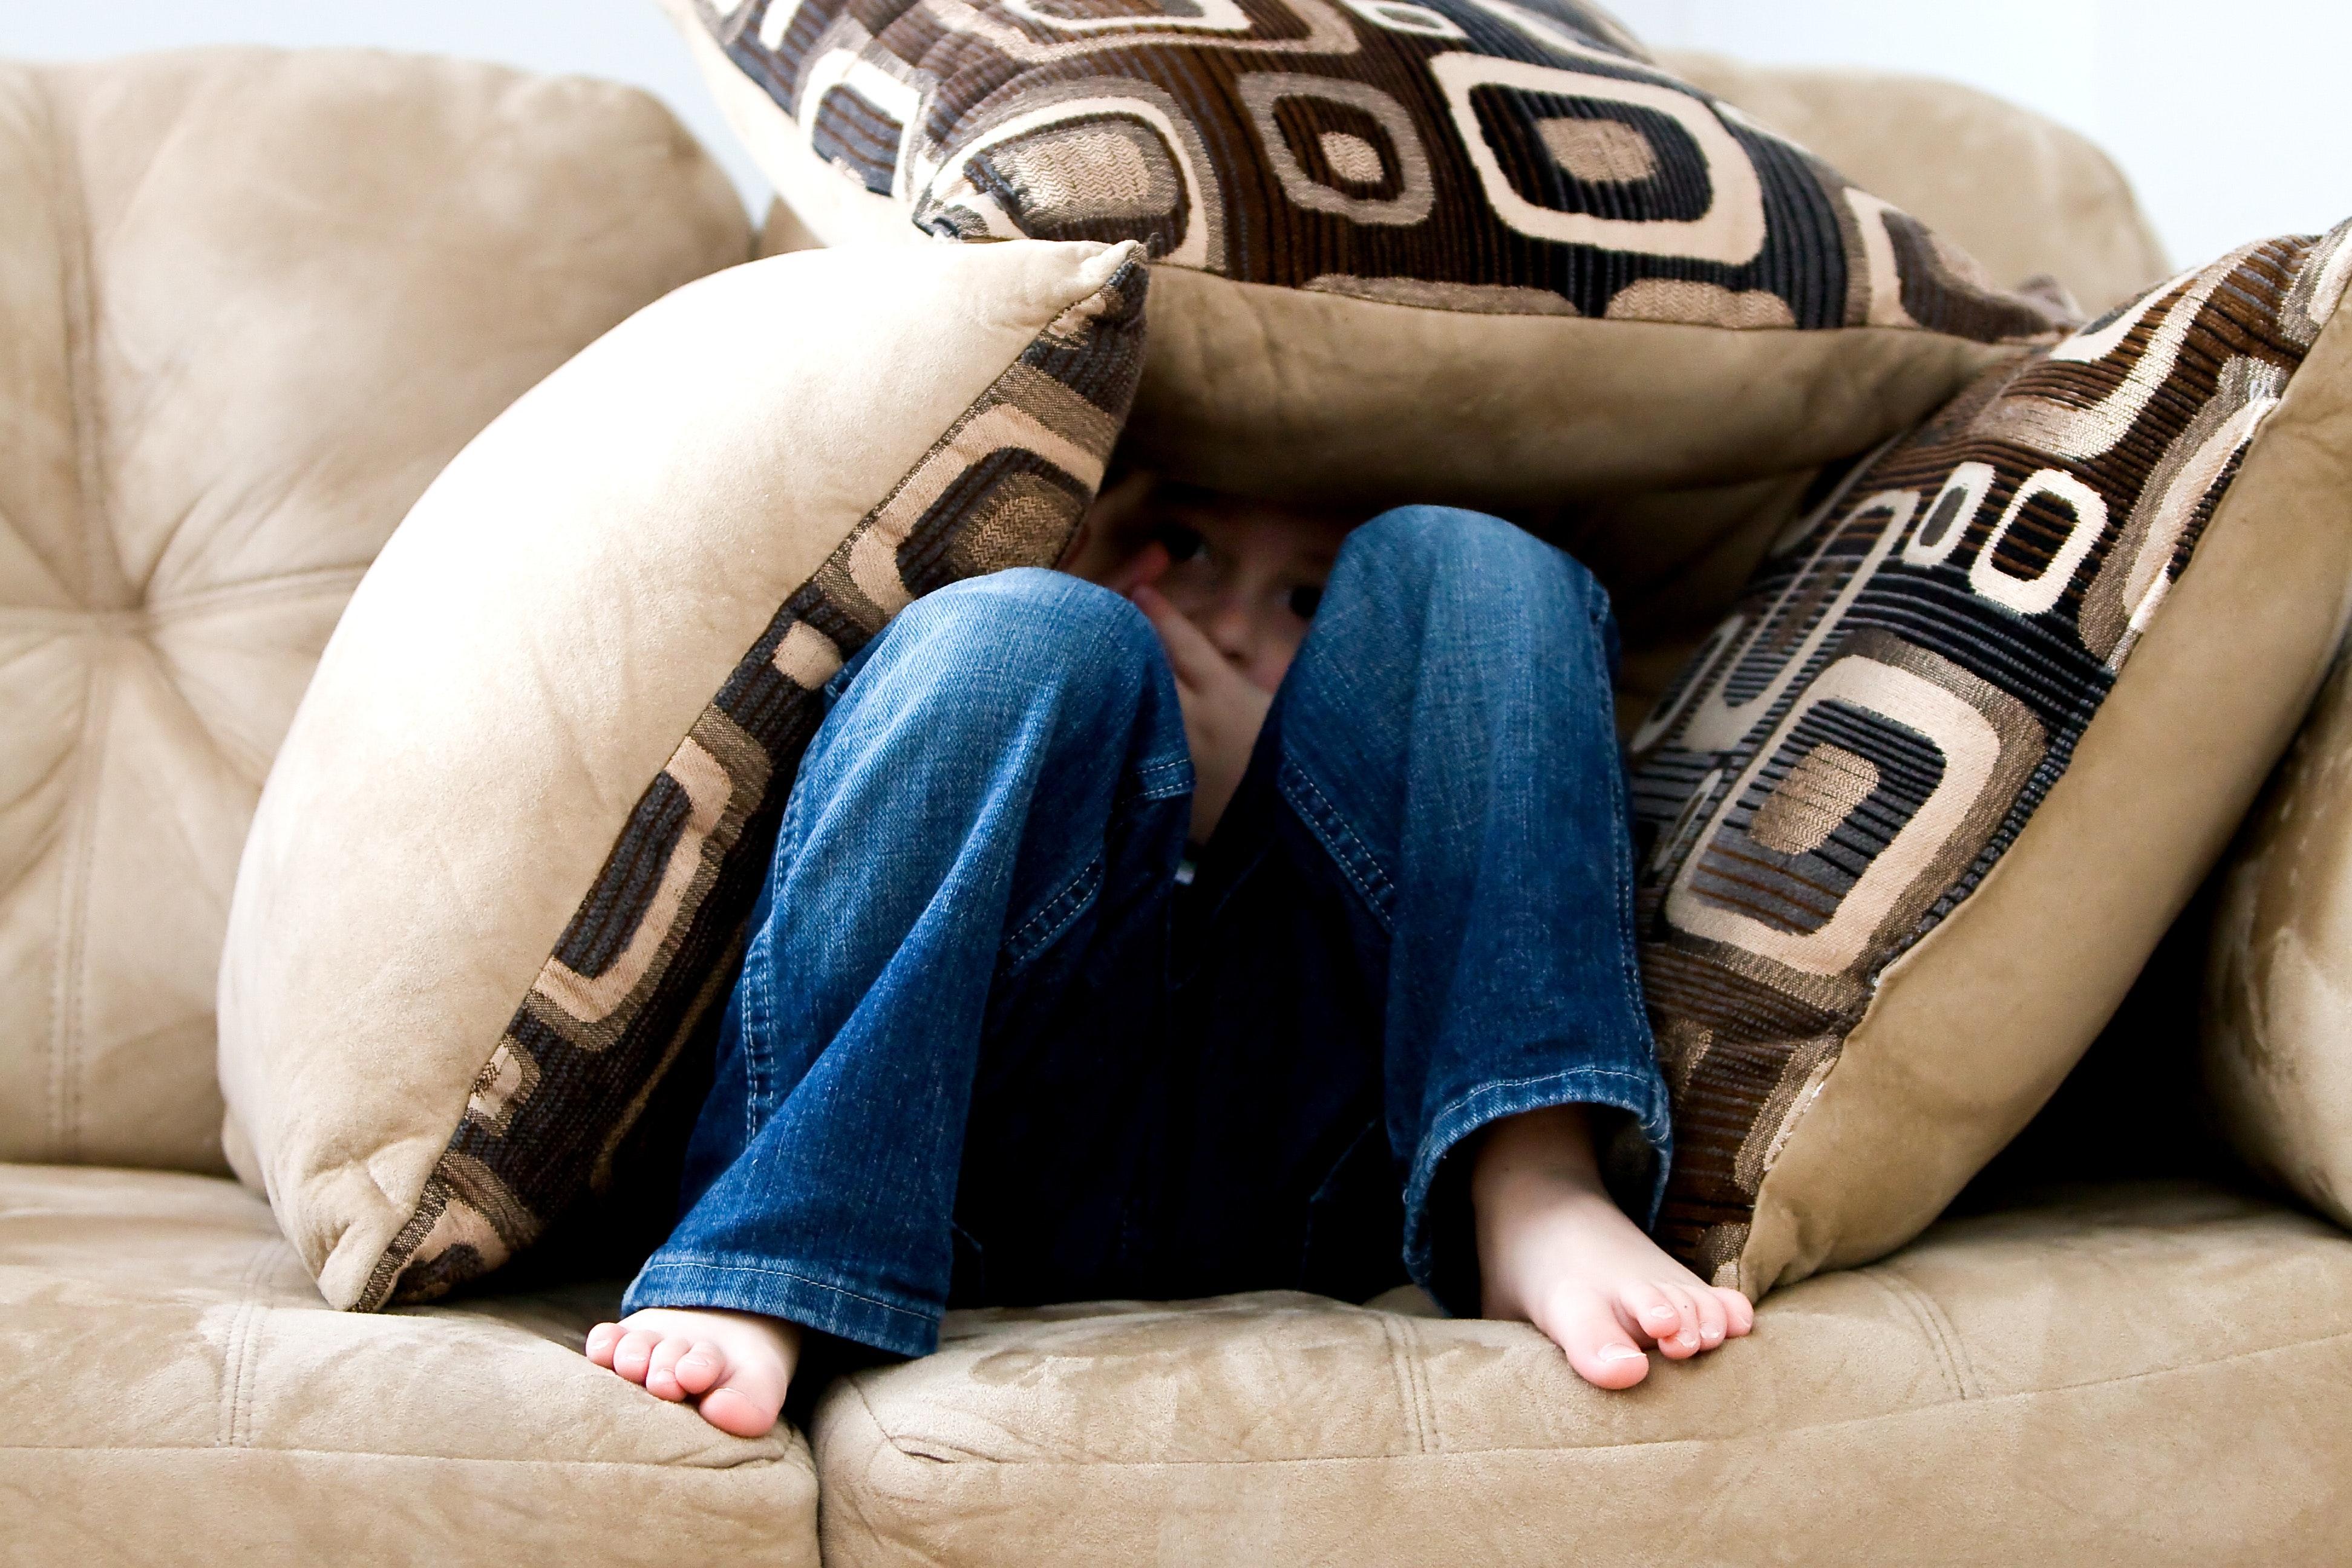 bare-feet-boy-child-couch-262103